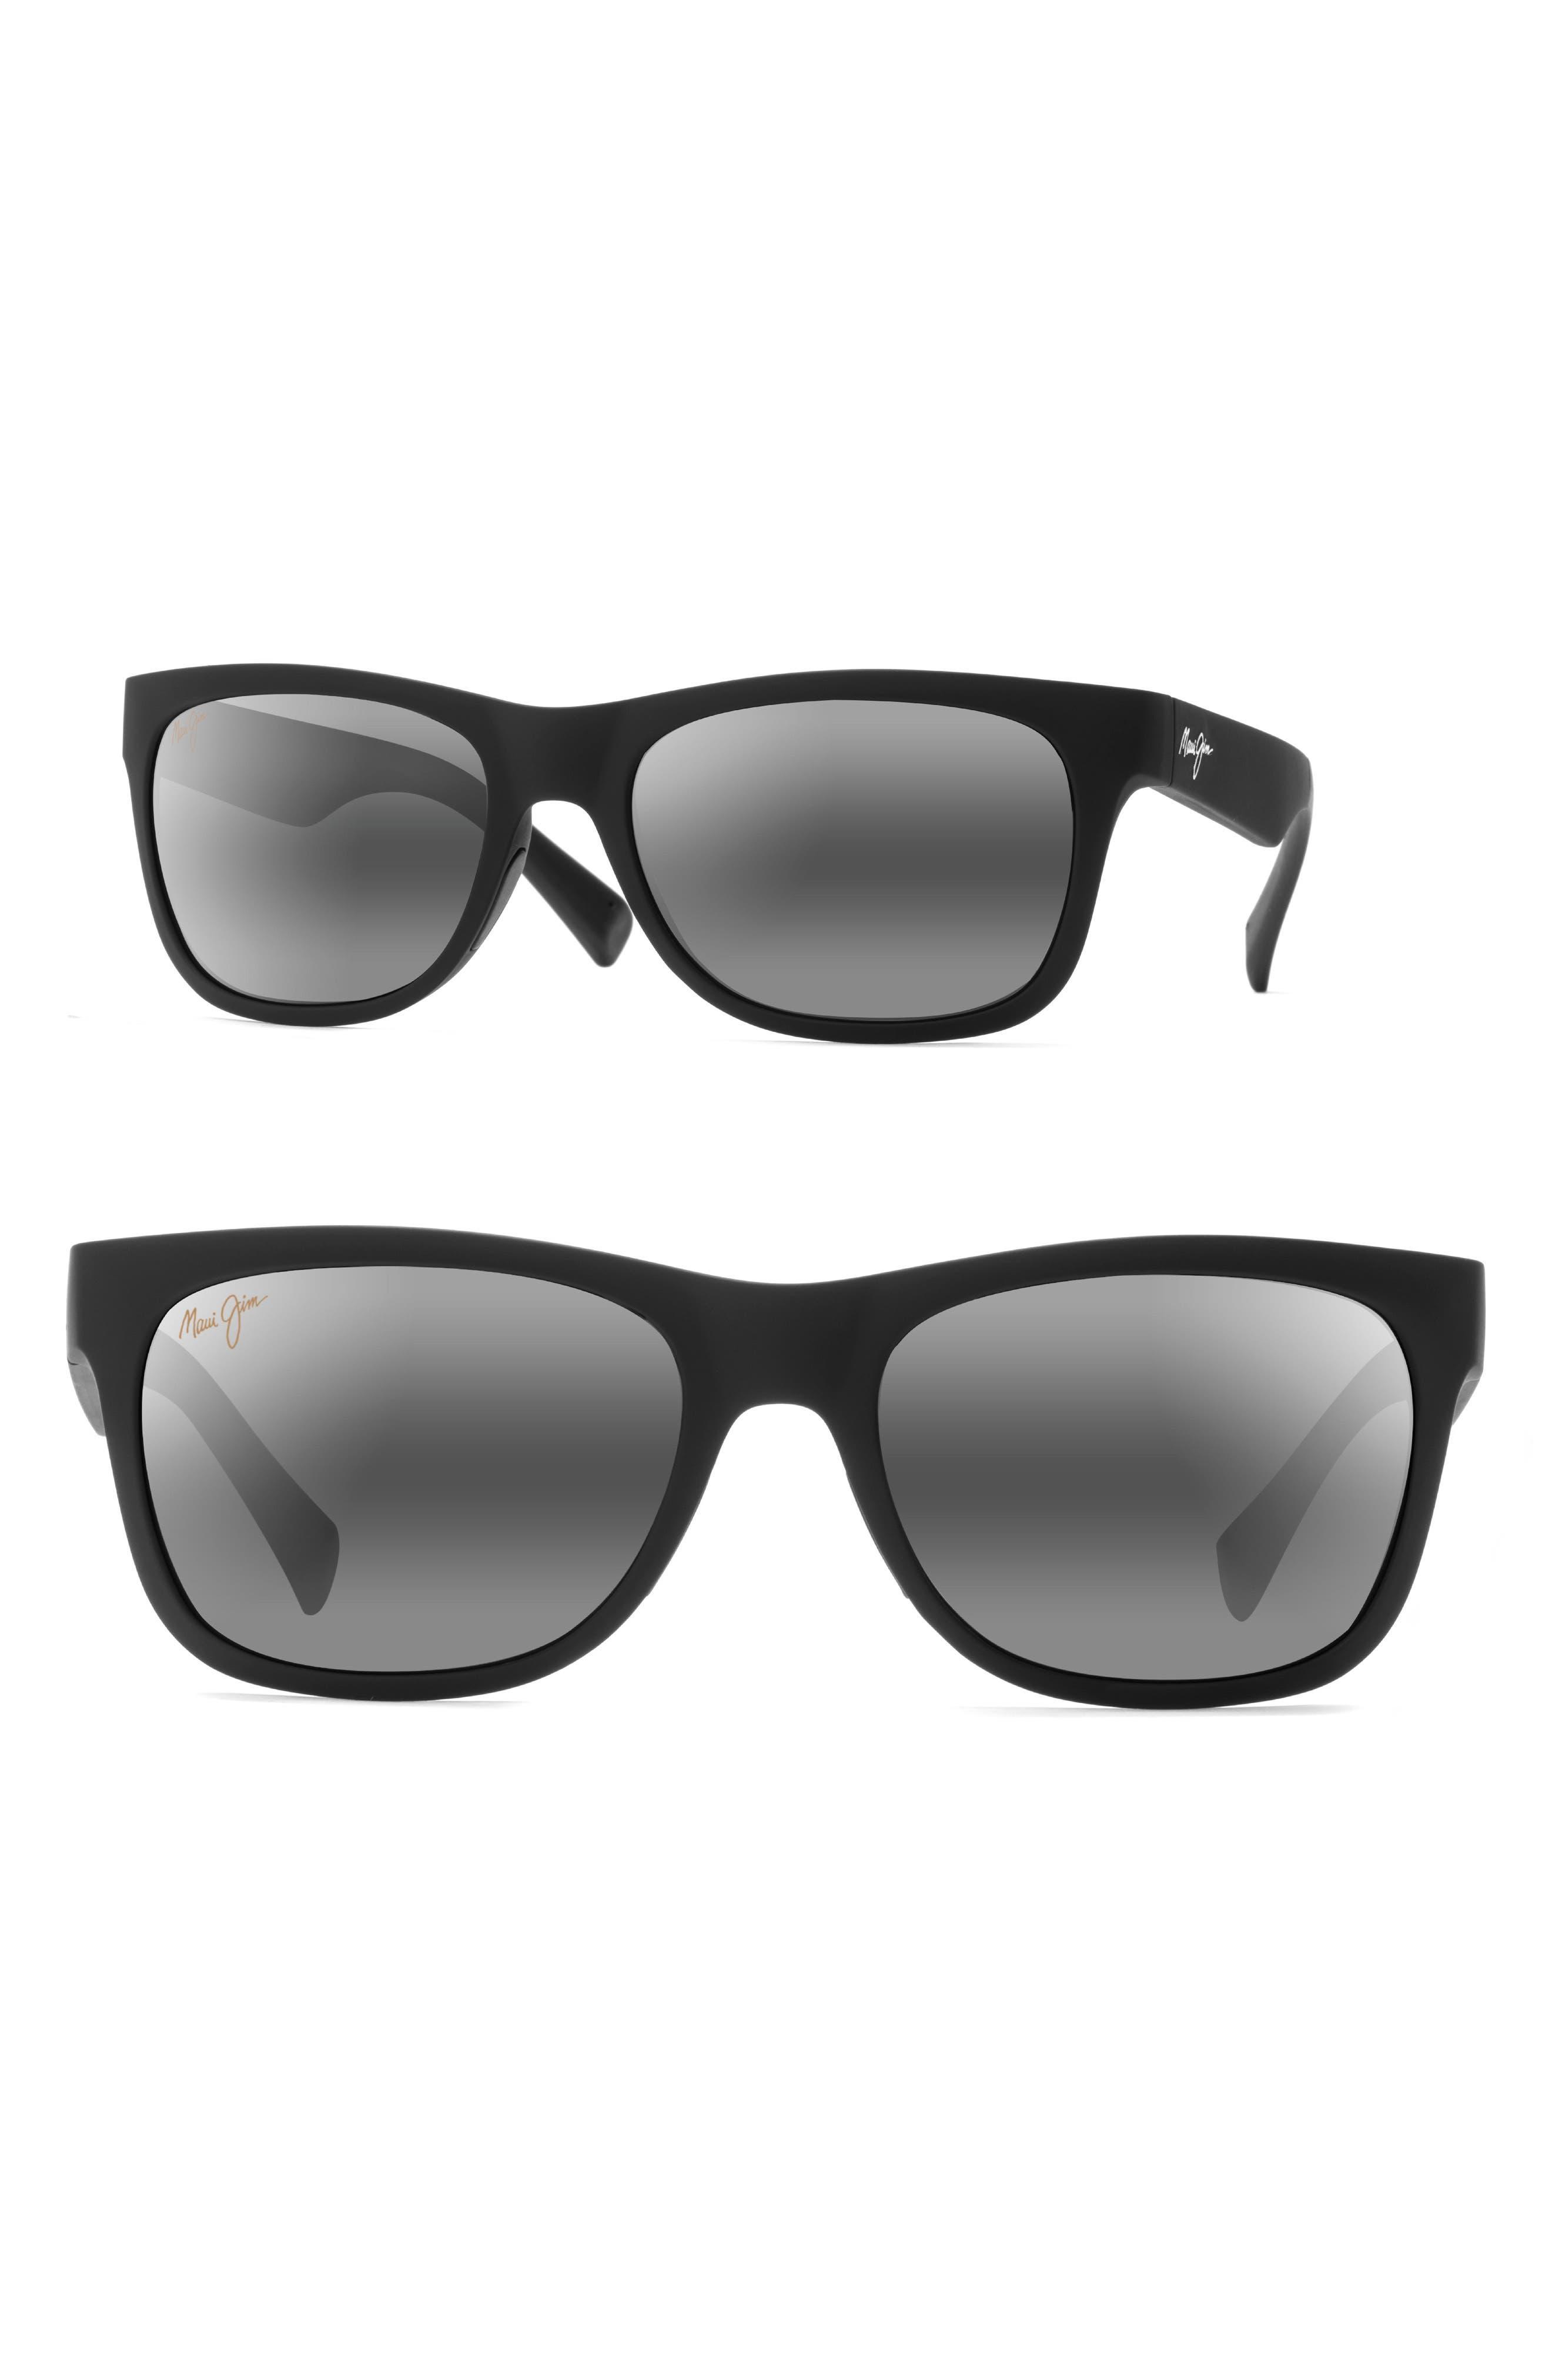 Kahi 58mm PolarizedPlus2<sup>®</sup> Sunglasses,                             Main thumbnail 1, color,                             Matte Black/ Neutral Grey